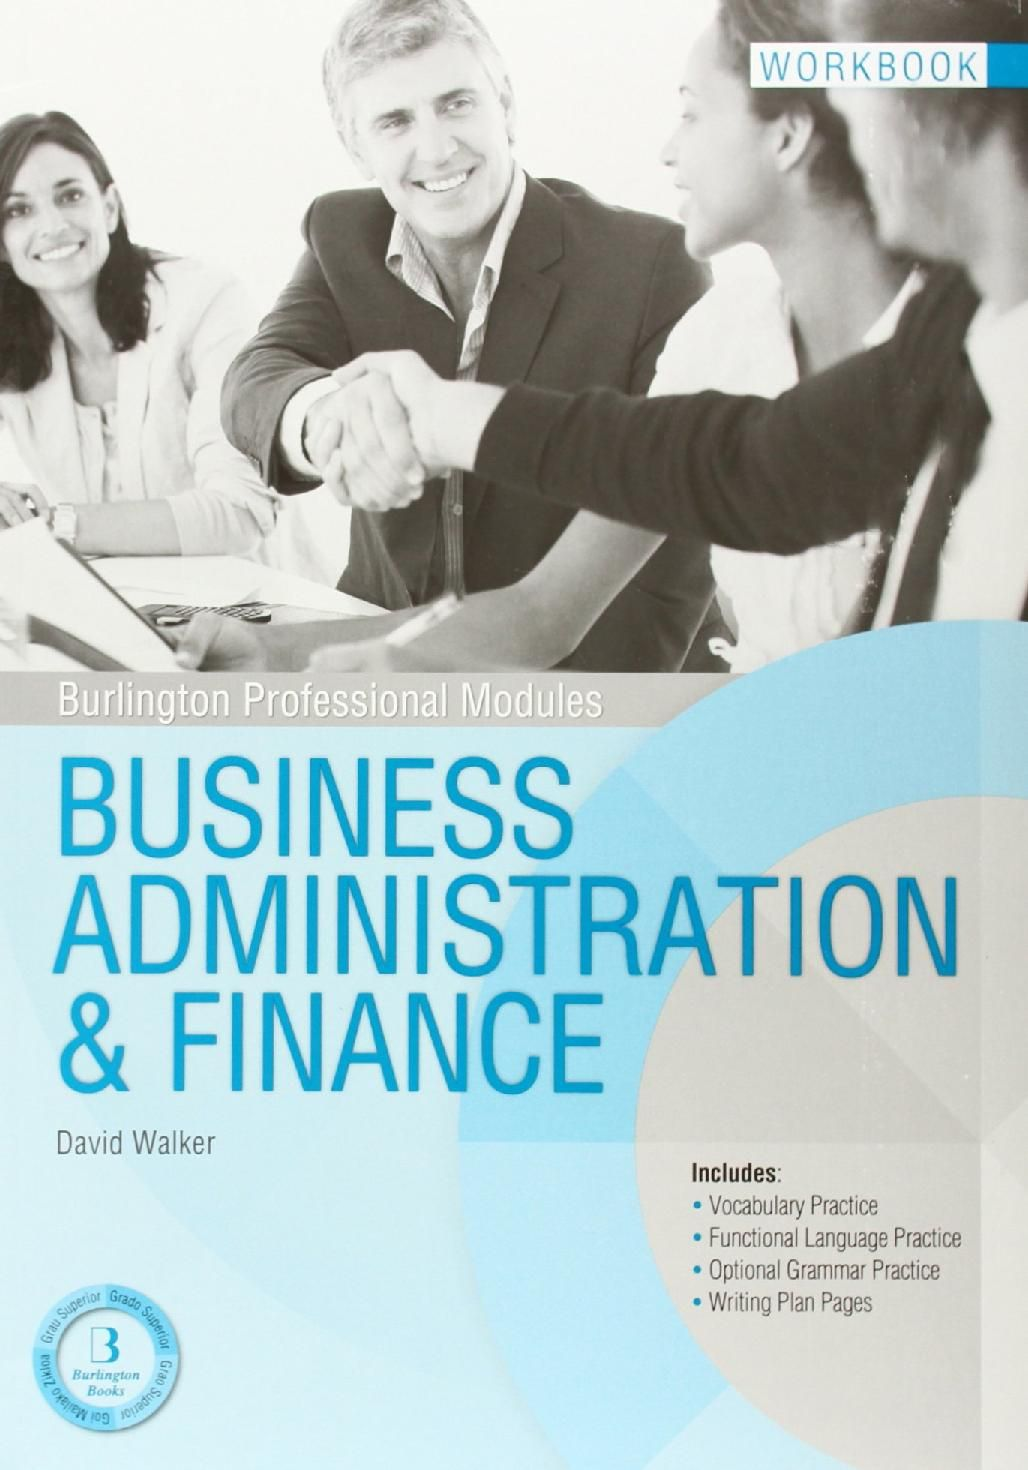 BUSINESS ADMINISTRATION & FINANCE (BPM.MODULOS)